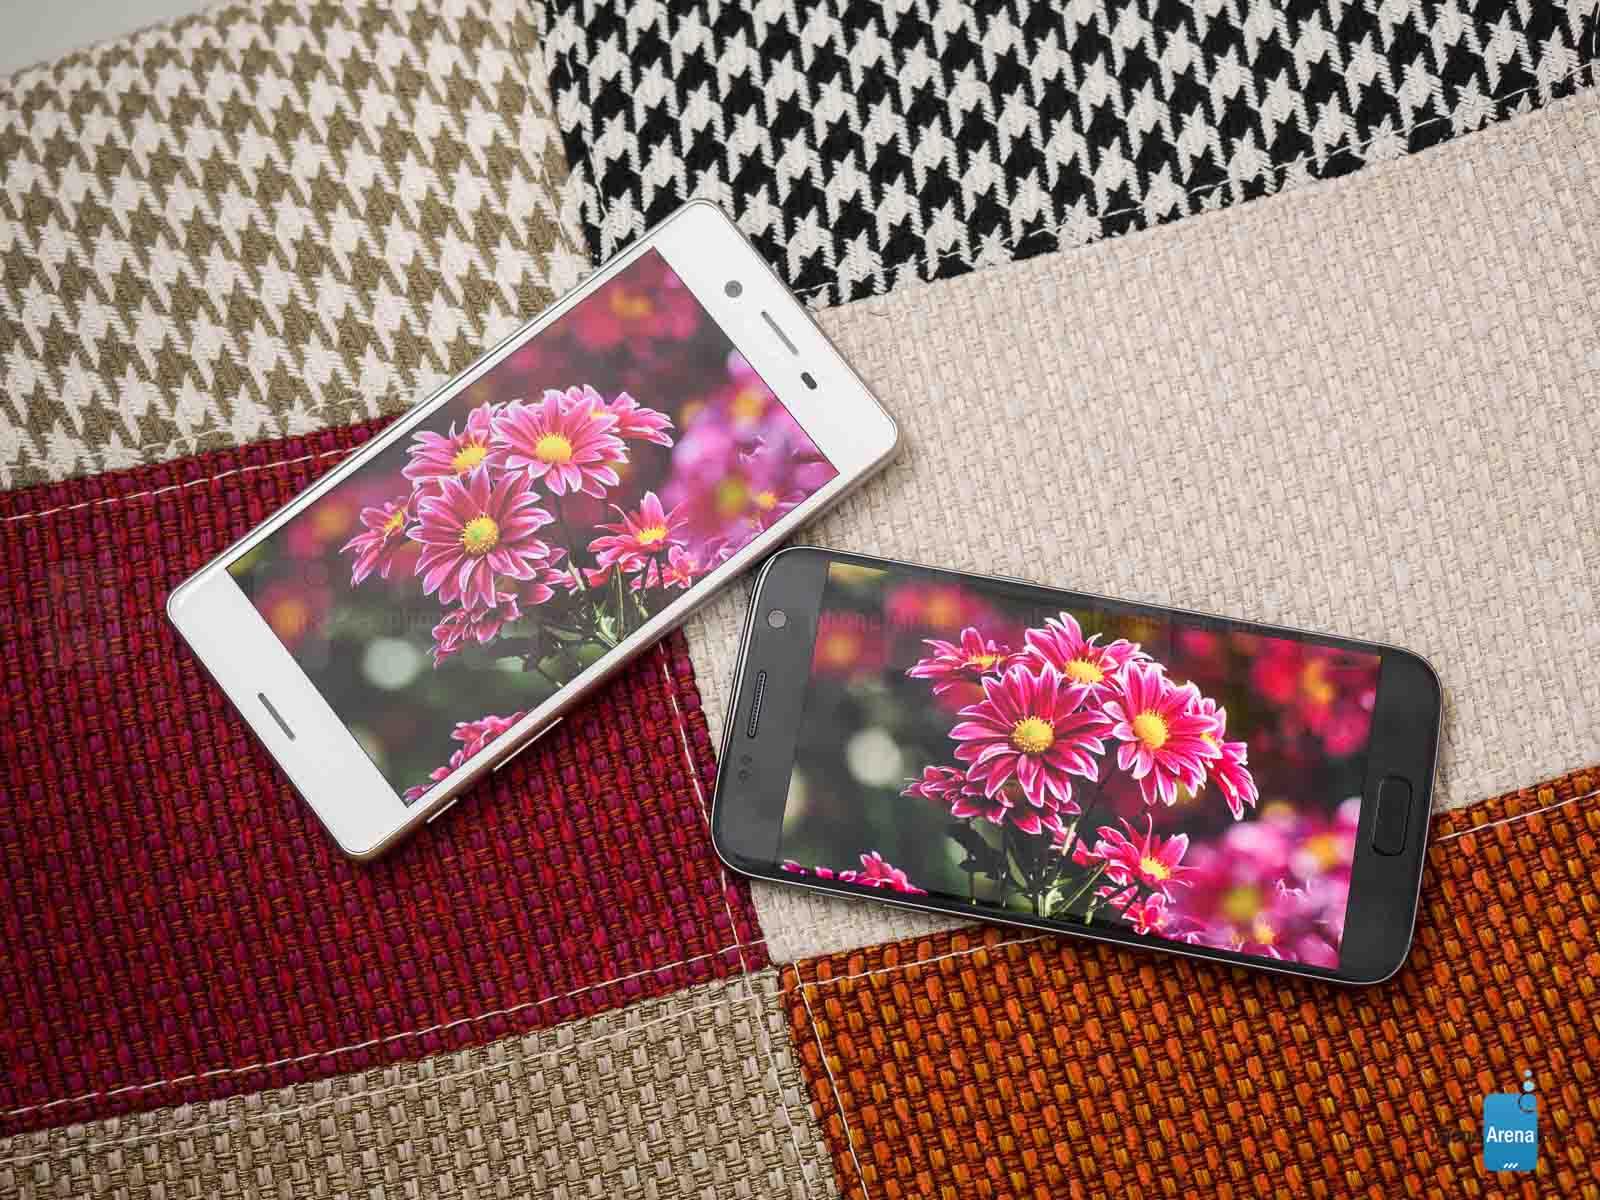 Sony-Xperia-X-Performance-vs-Samsung-Galaxy-S7-014